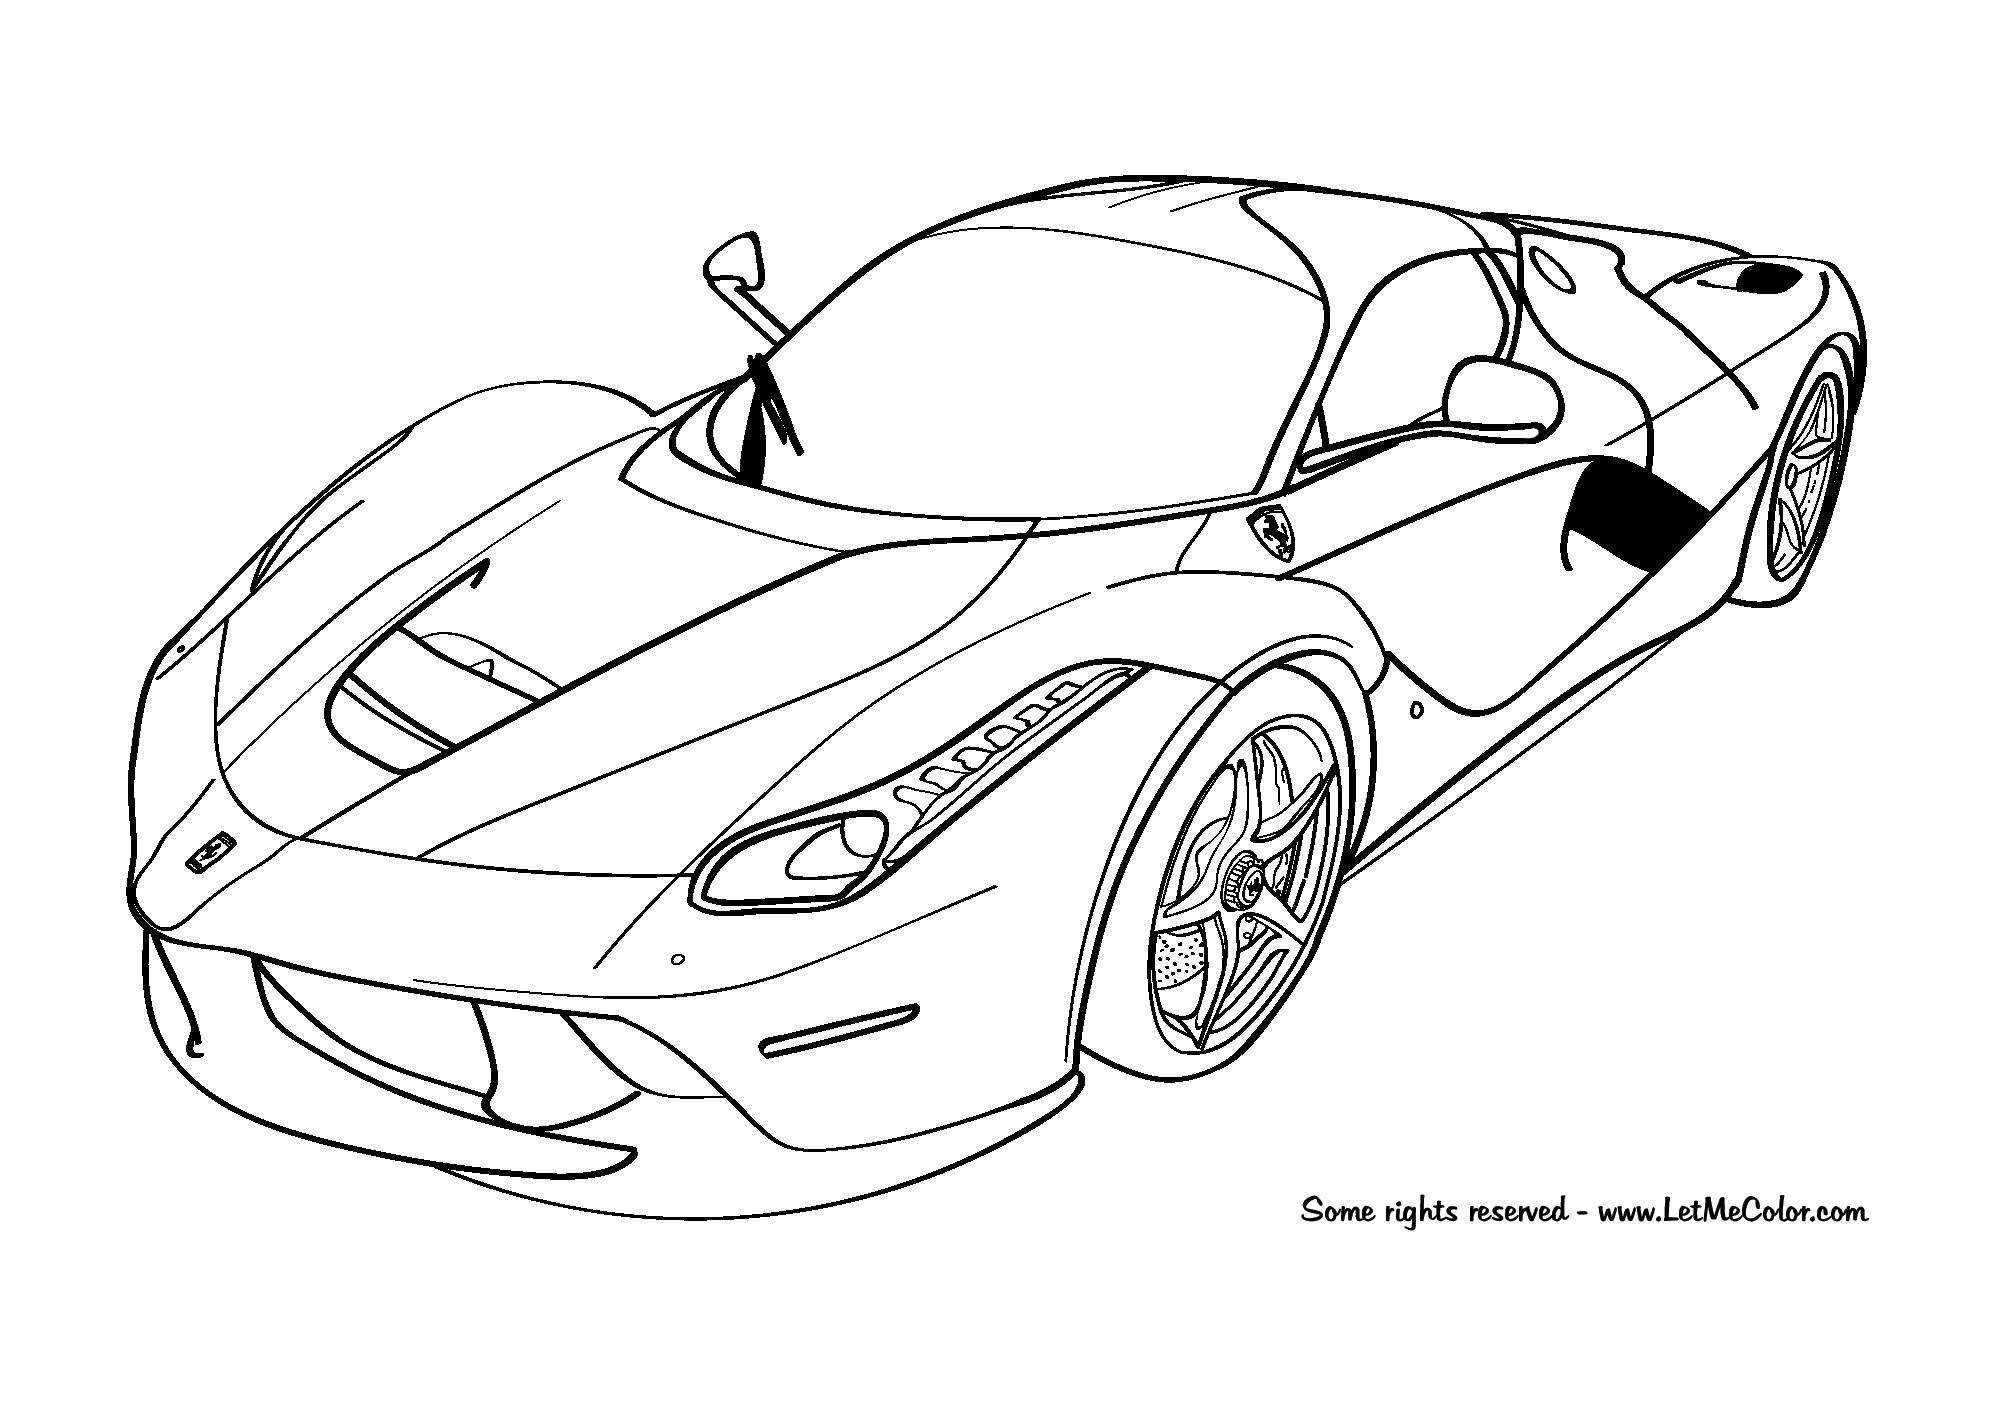 2000x1414 Sports Car Coloring Pages Inspirational Super Car Mclaren F1 Lm